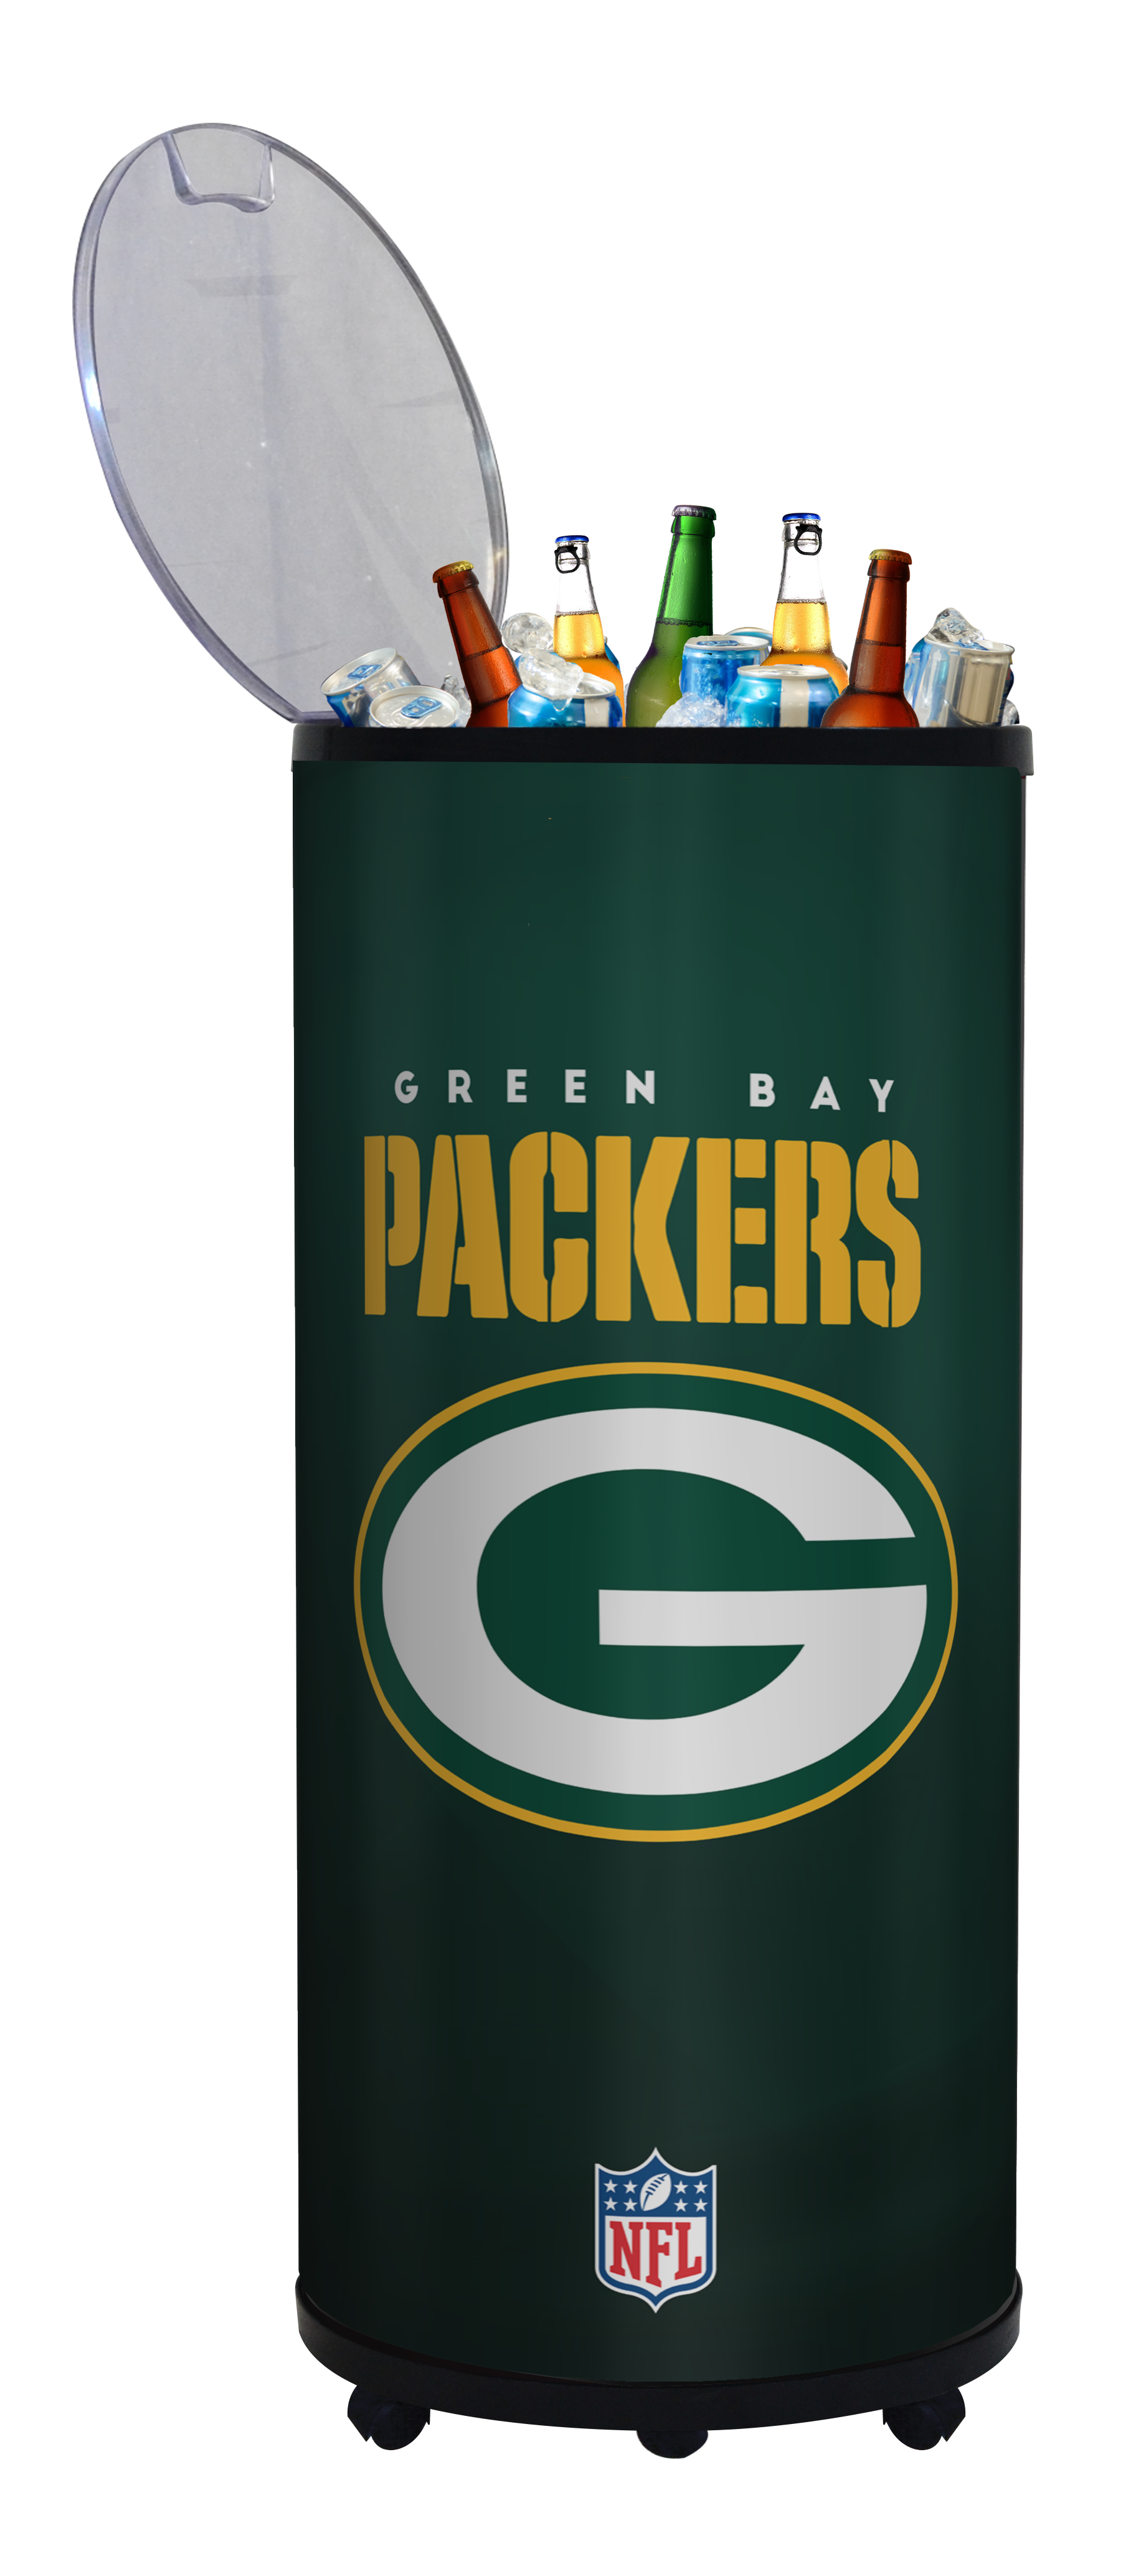 Pin By Glaros Us On Green Bay Packers Fan Green Bay Packers Green Bay Packers Fans Packers